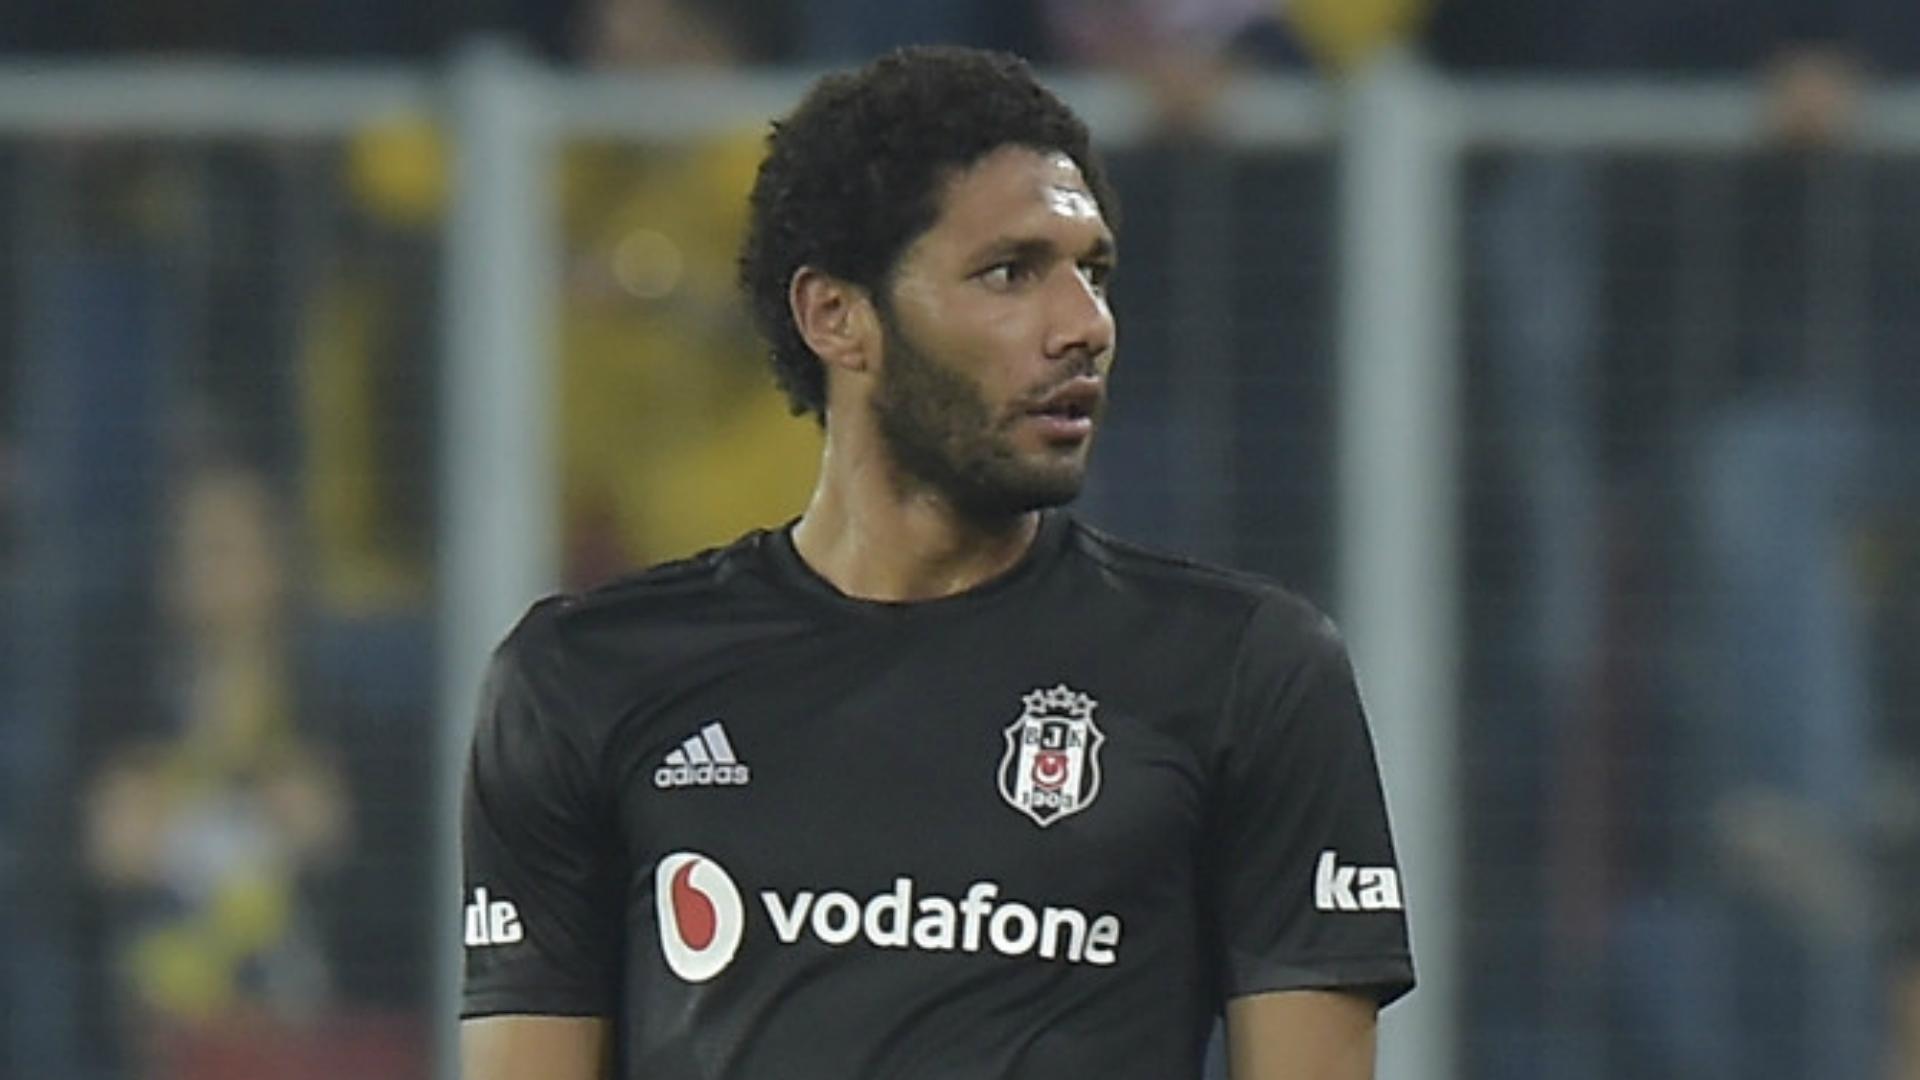 Elneny in advanced negotiations with AC Milan – Nasser